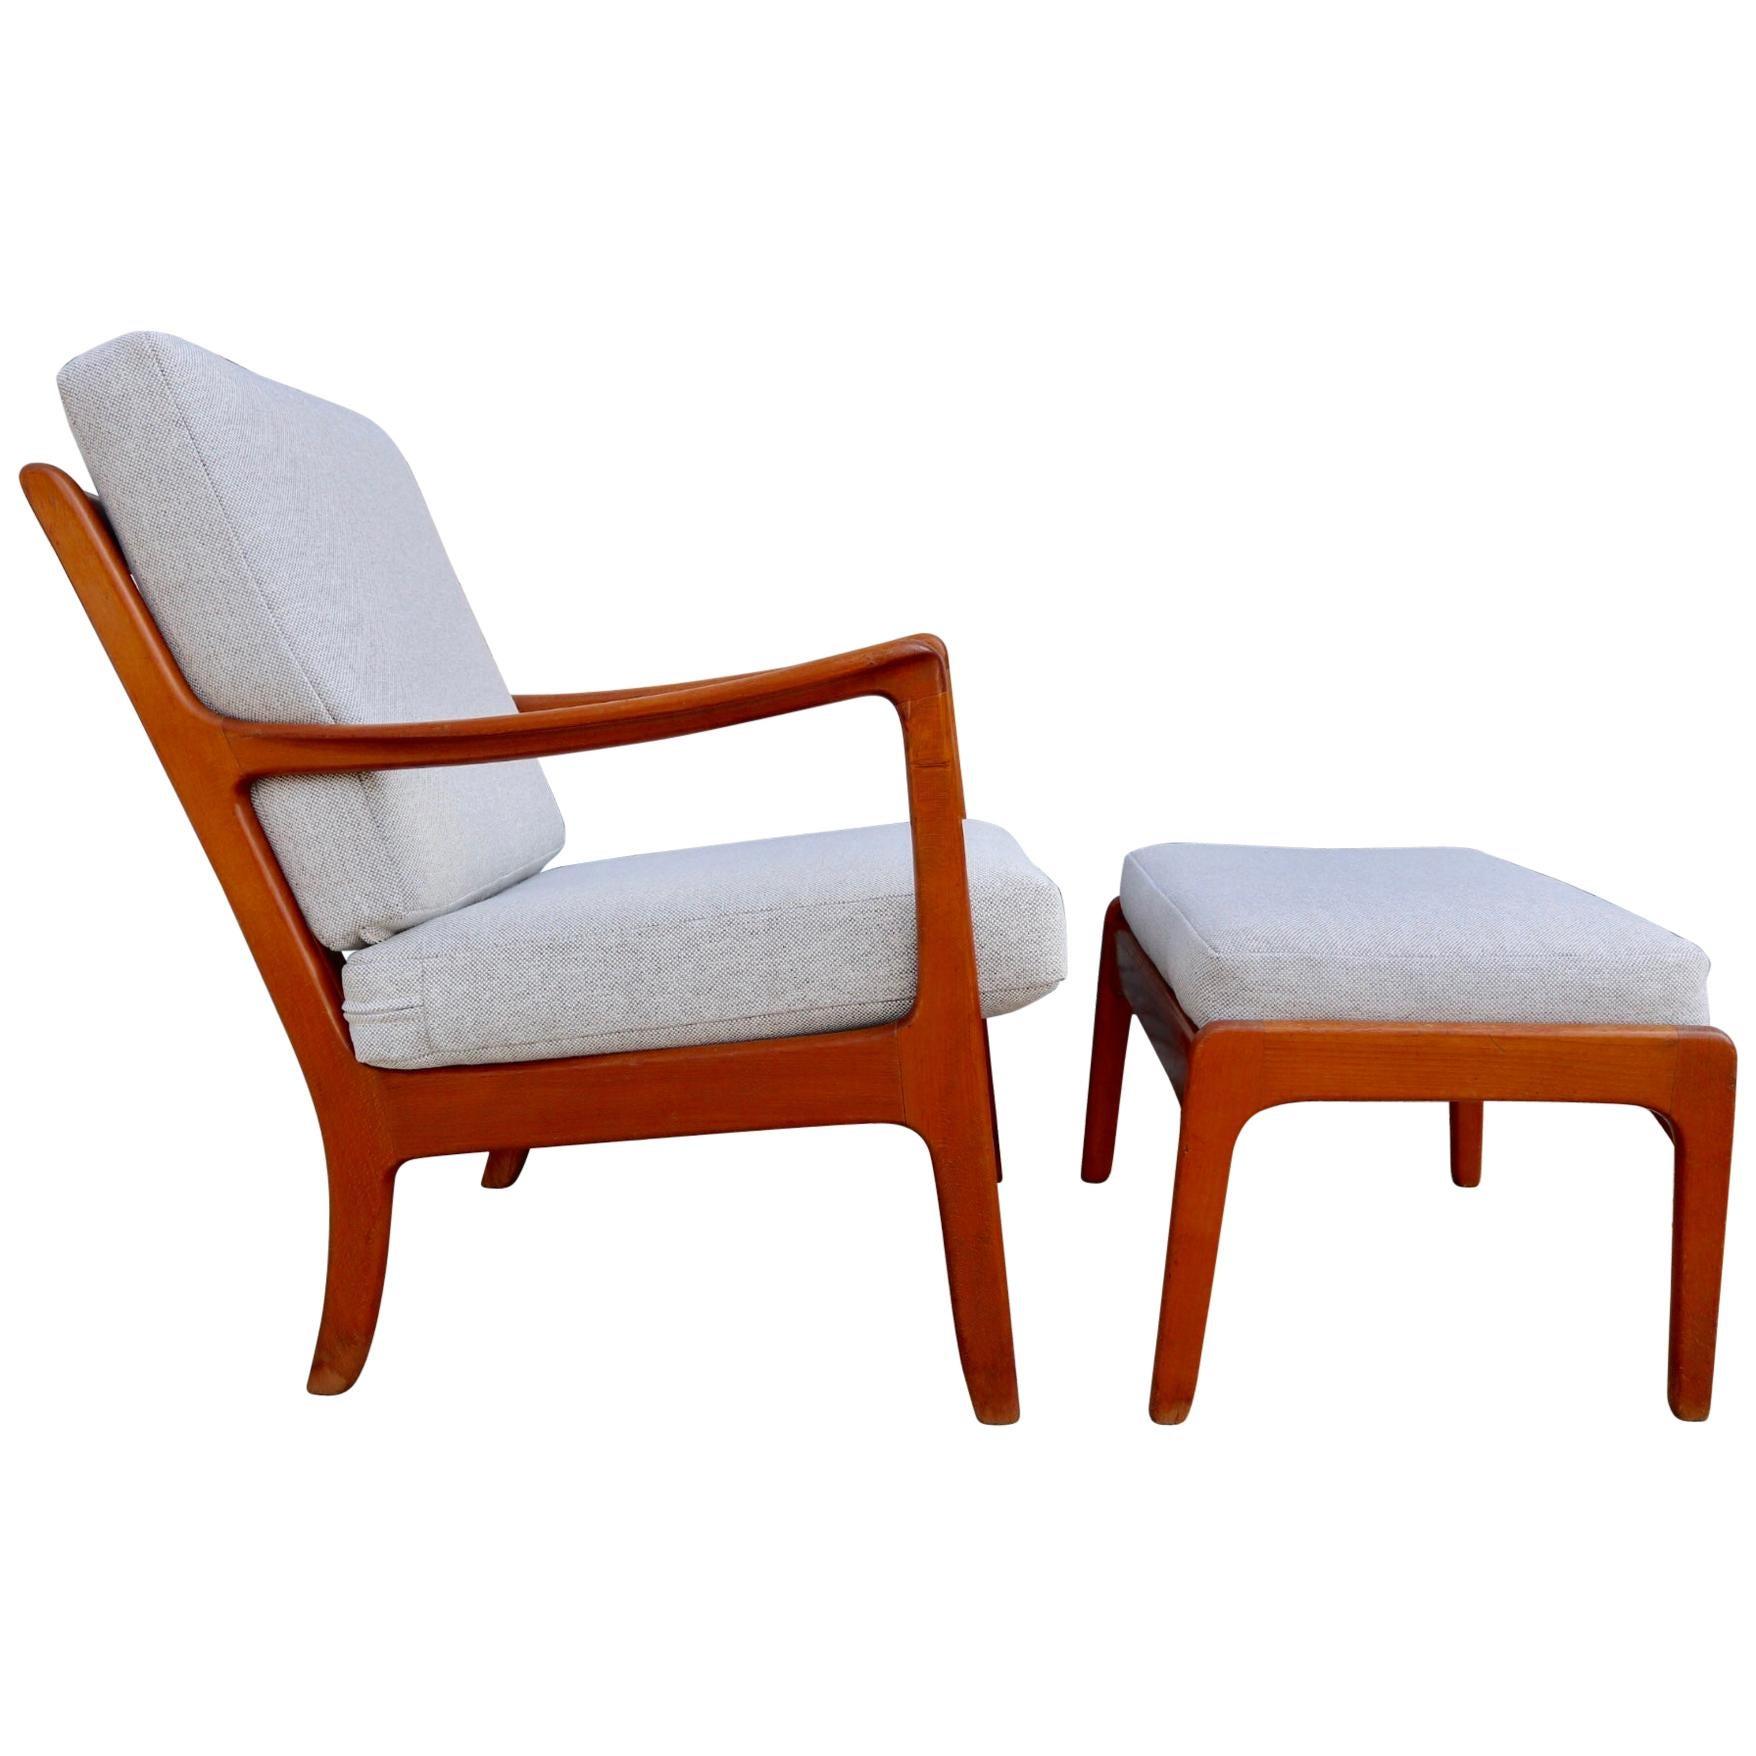 Ole Wanscher Lounge Chair and Ottoman for John Stuart